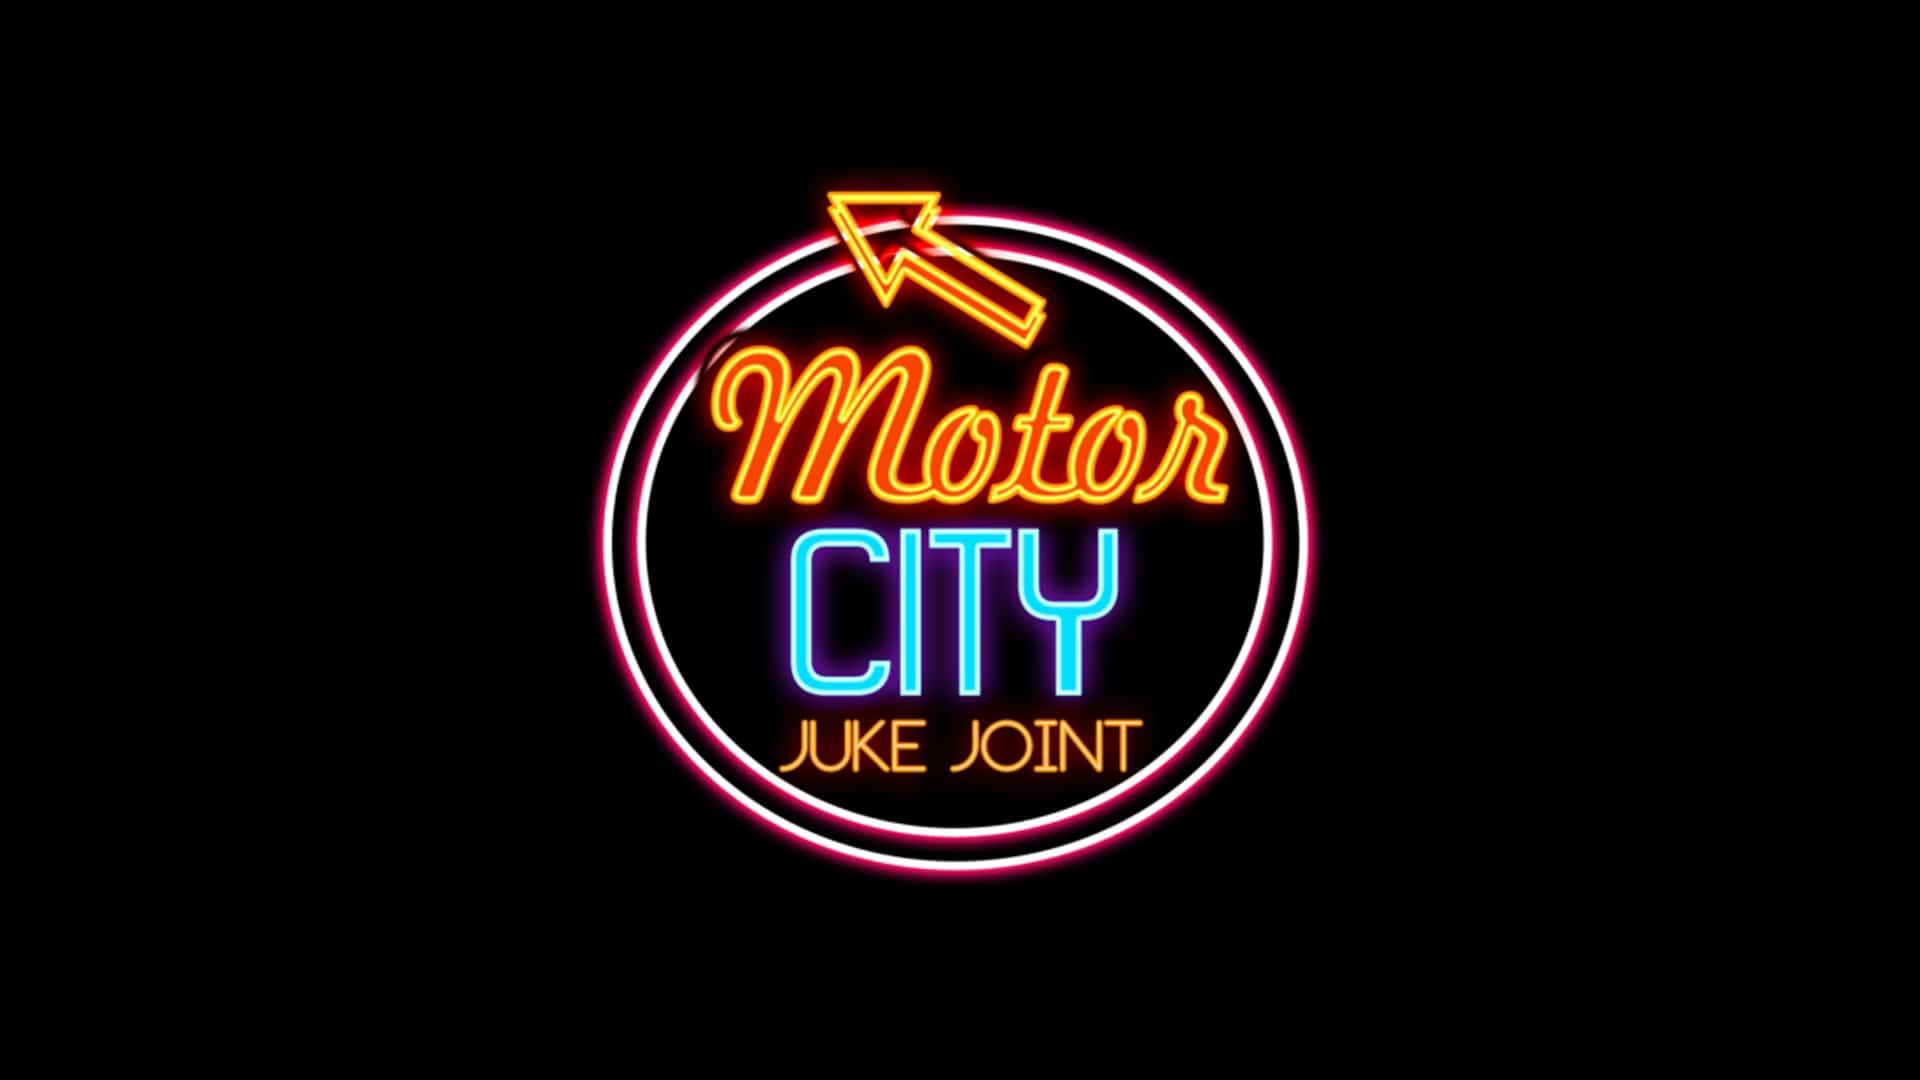 Motor City Juke Joint - Episode 217